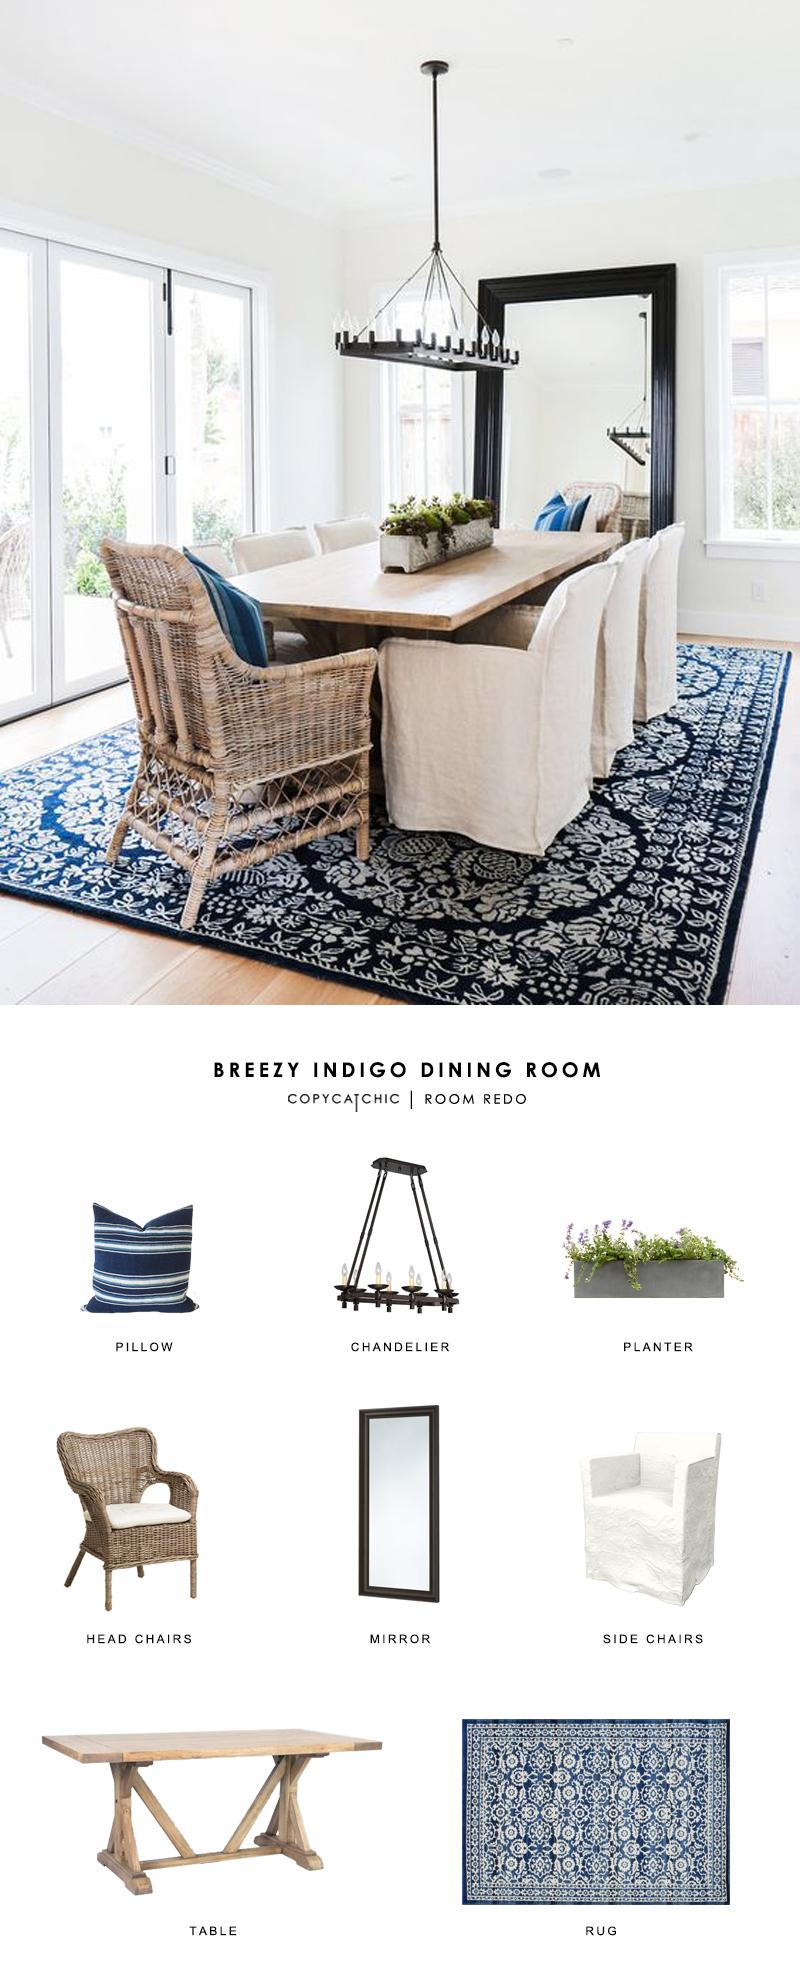 Copy cat chic room redo breezy indigo dining room for Modern home decor for less